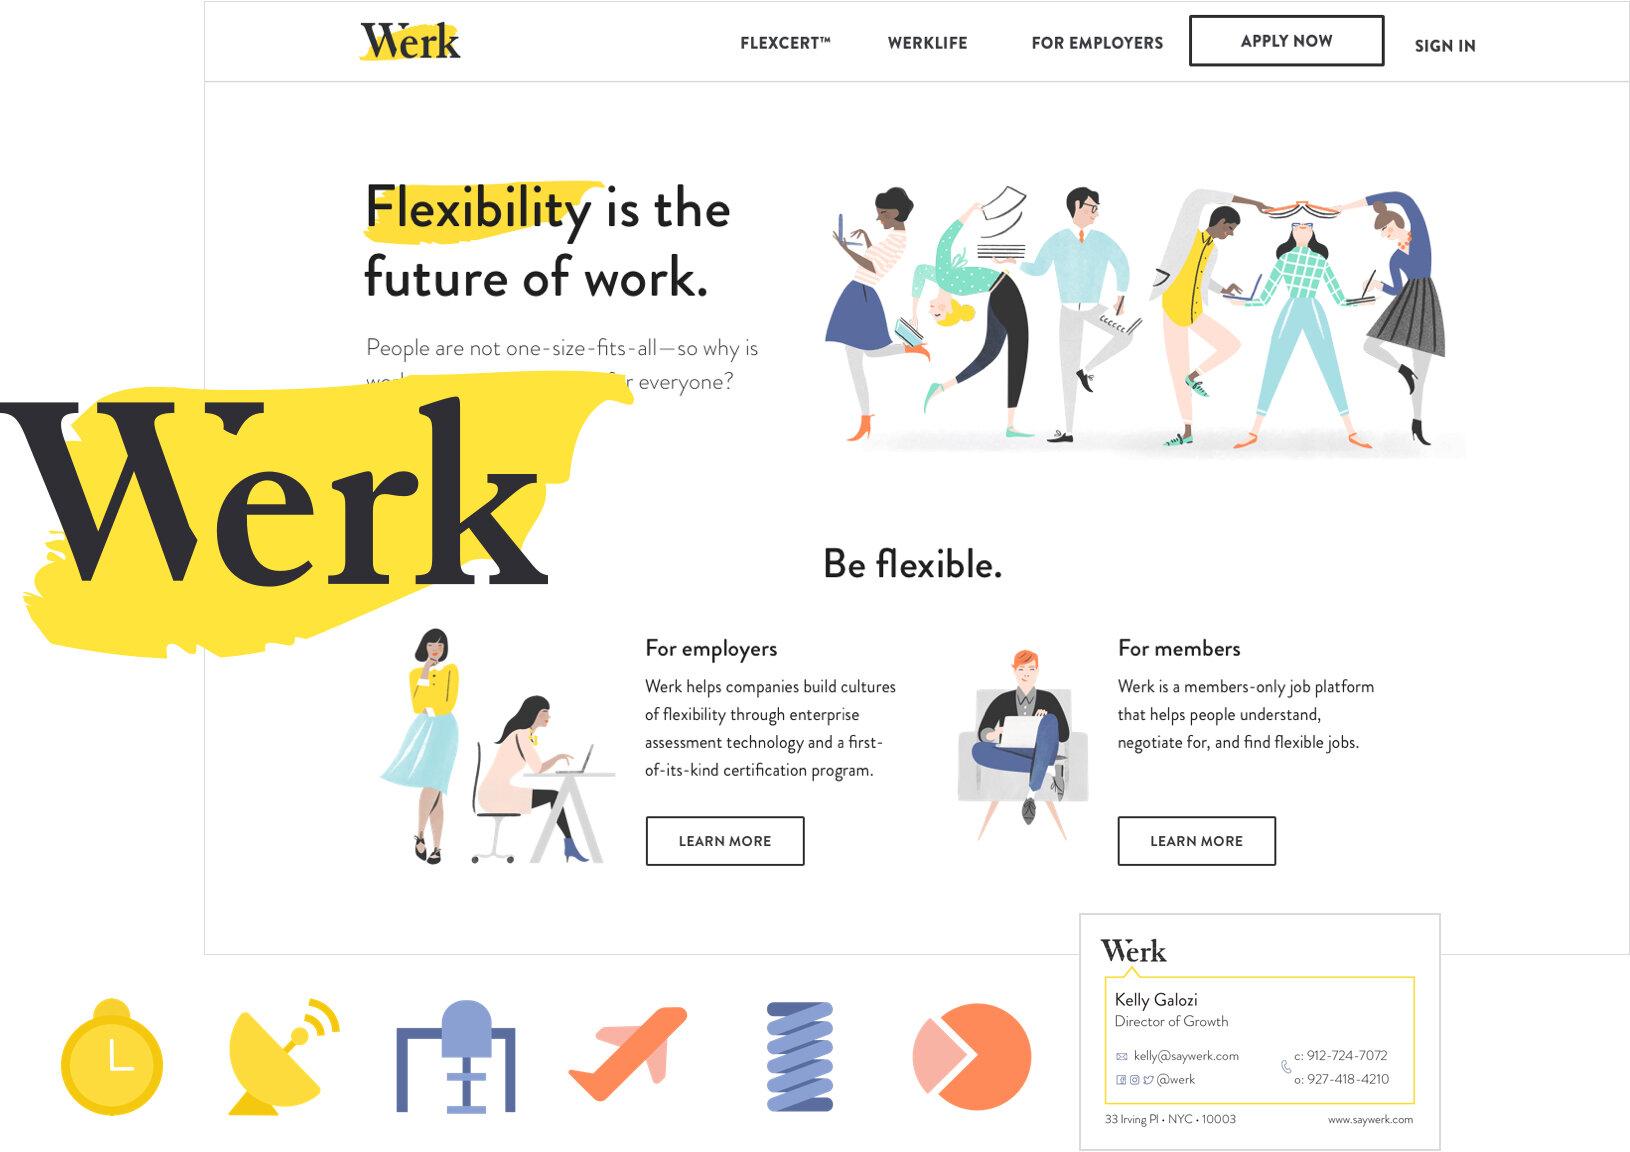 Original Werk branding geared toward women in the B2C space